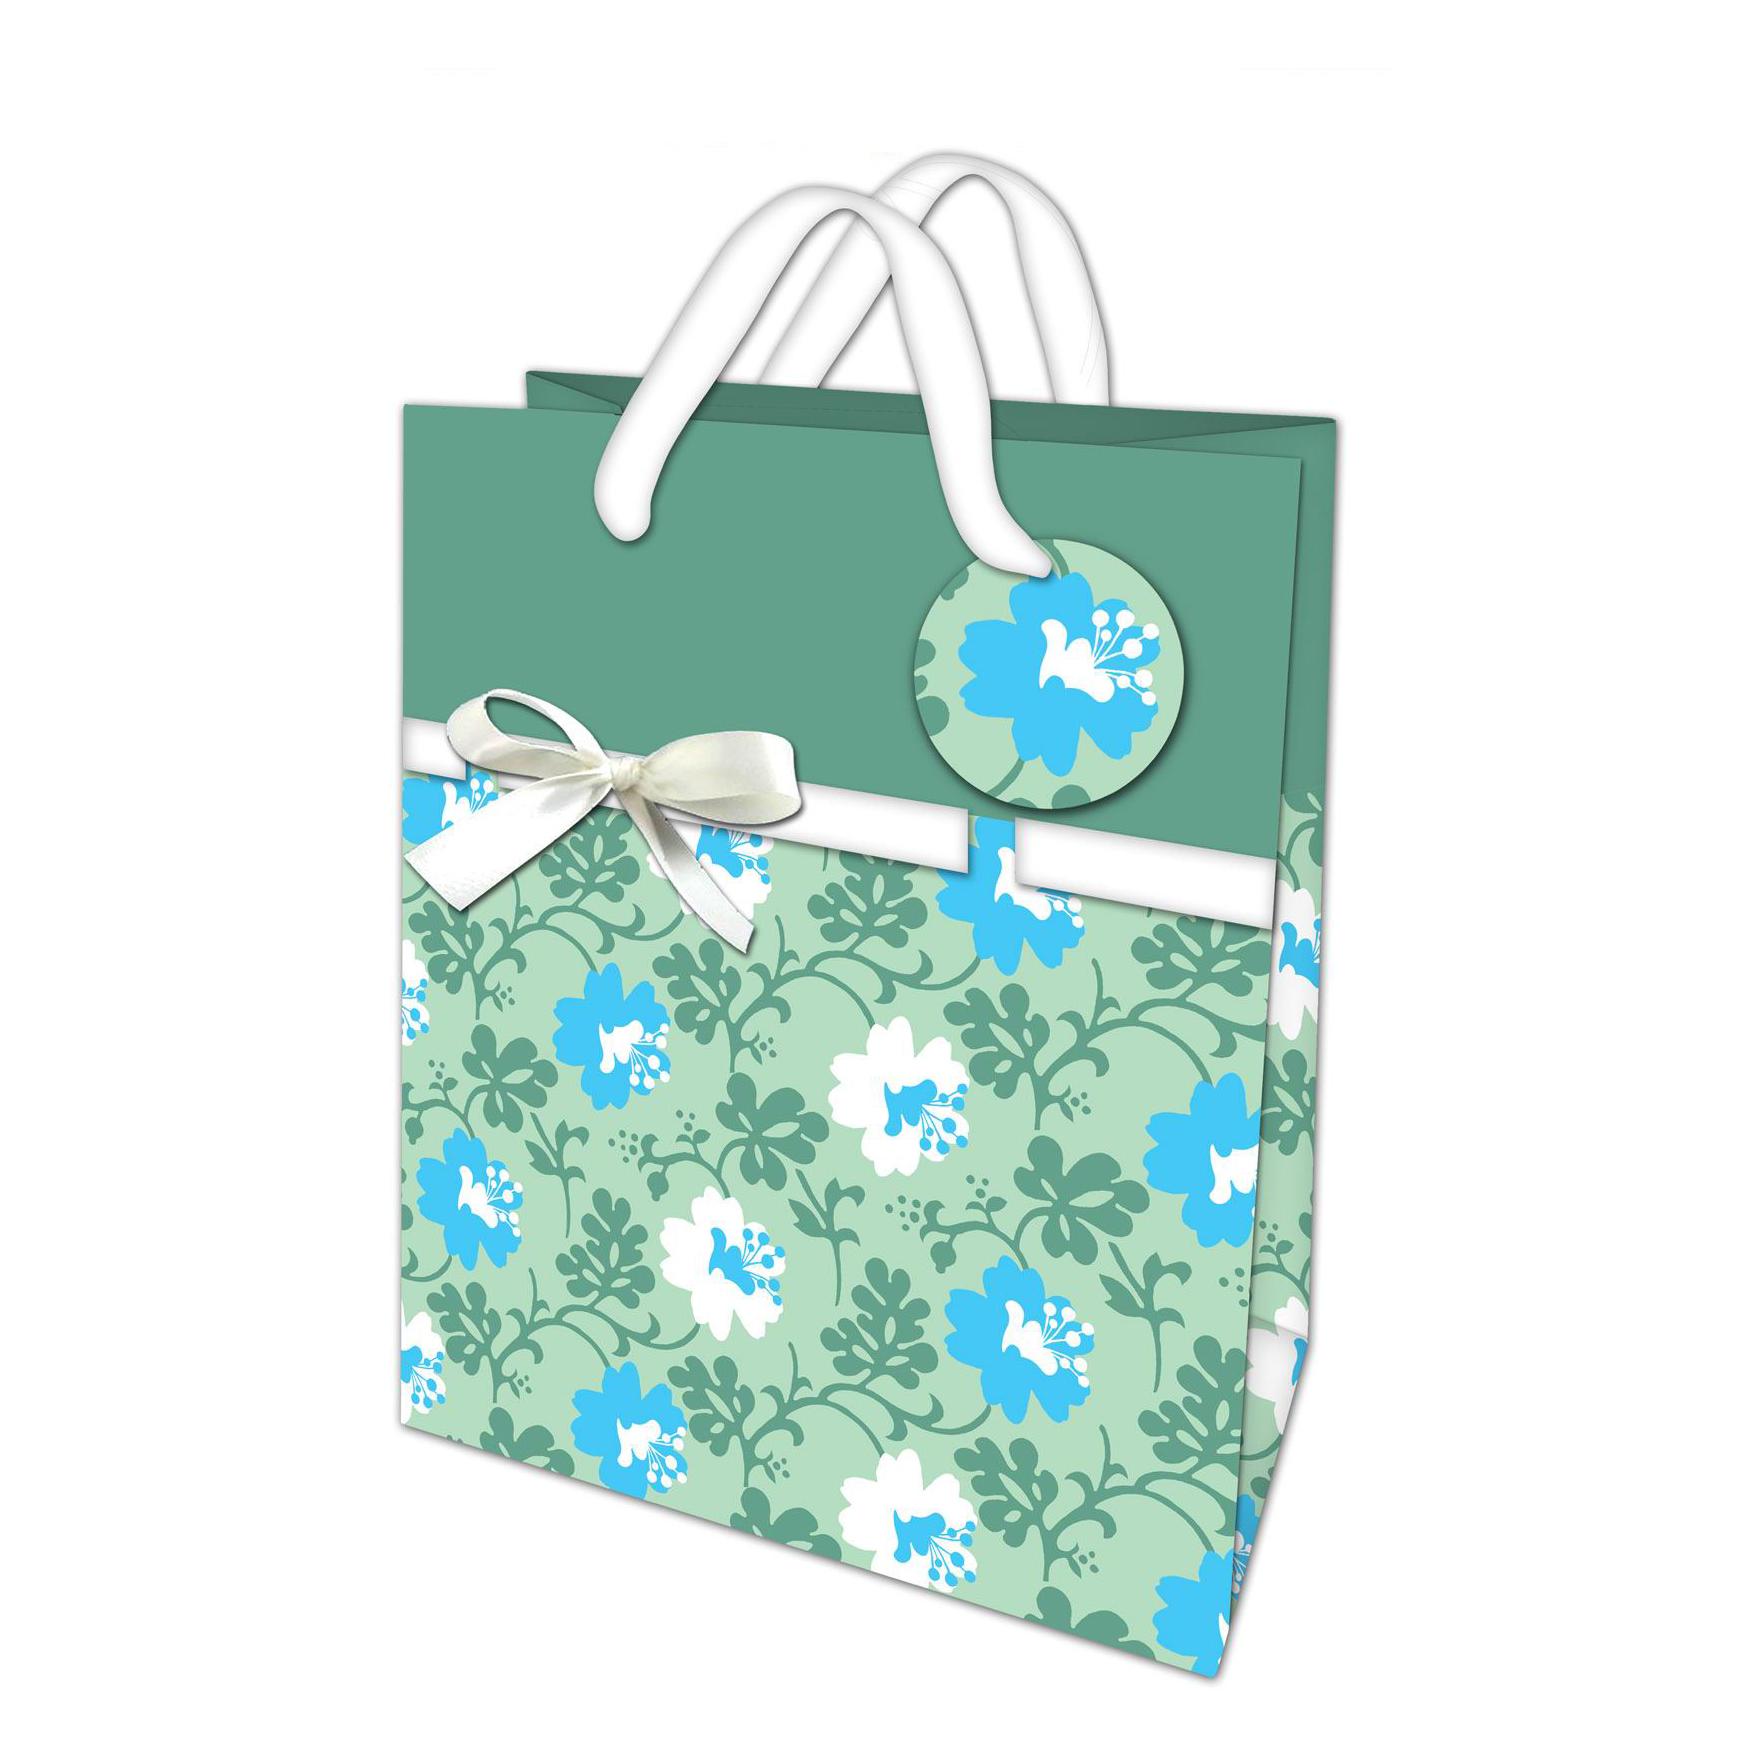 Recycled Custom Logo Flower Design Kraft Paper Gift Bag With Handles, Clothing Packaging Paper Bag